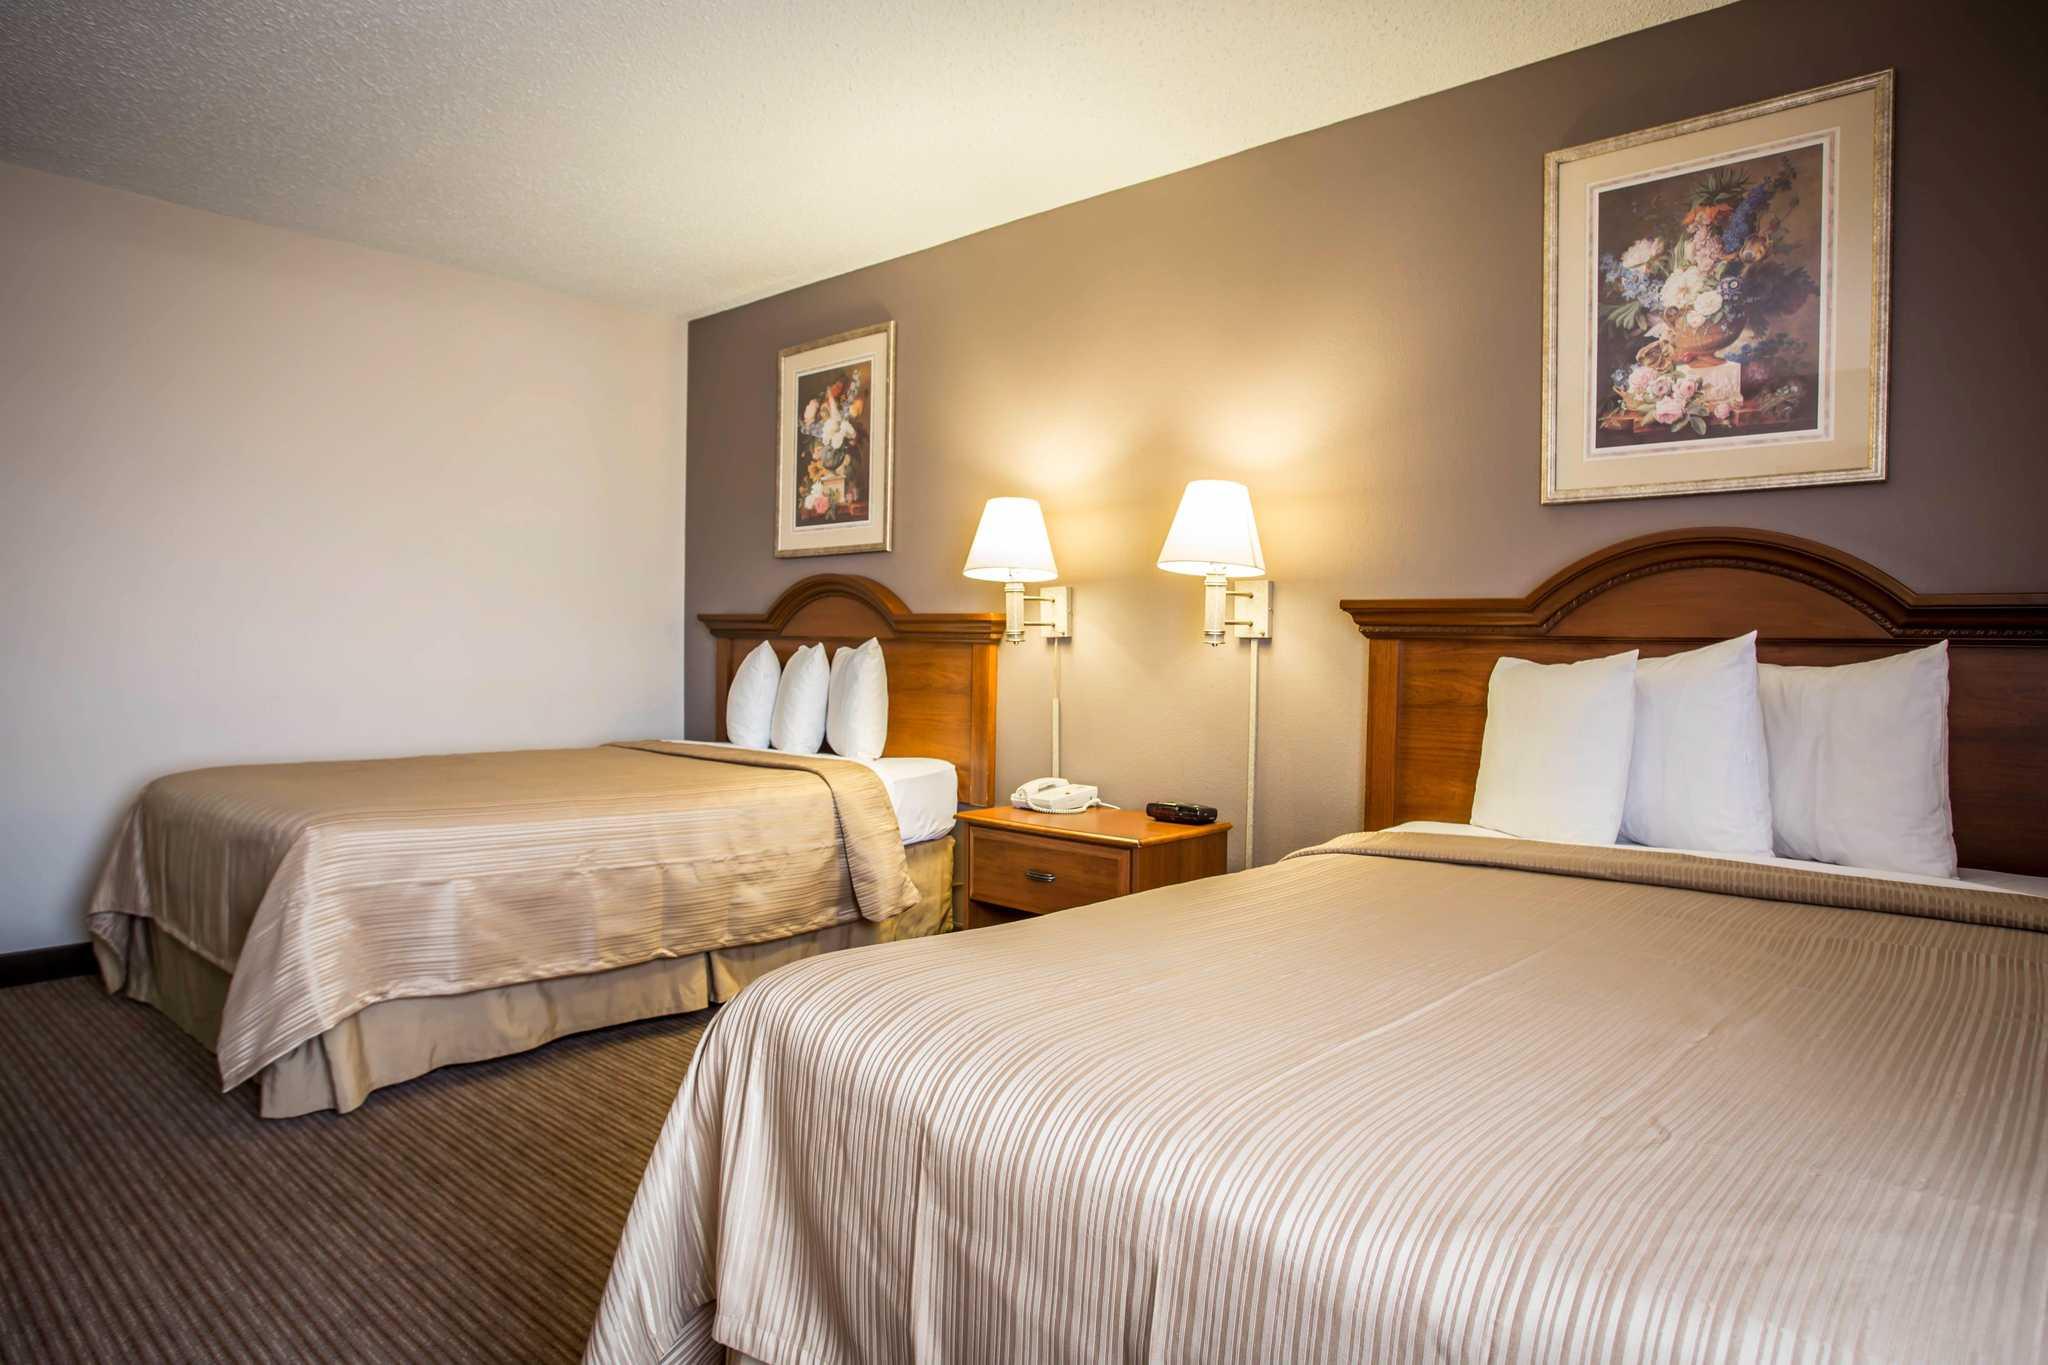 Quality Inn & Suites Matthews - Charlotte image 19